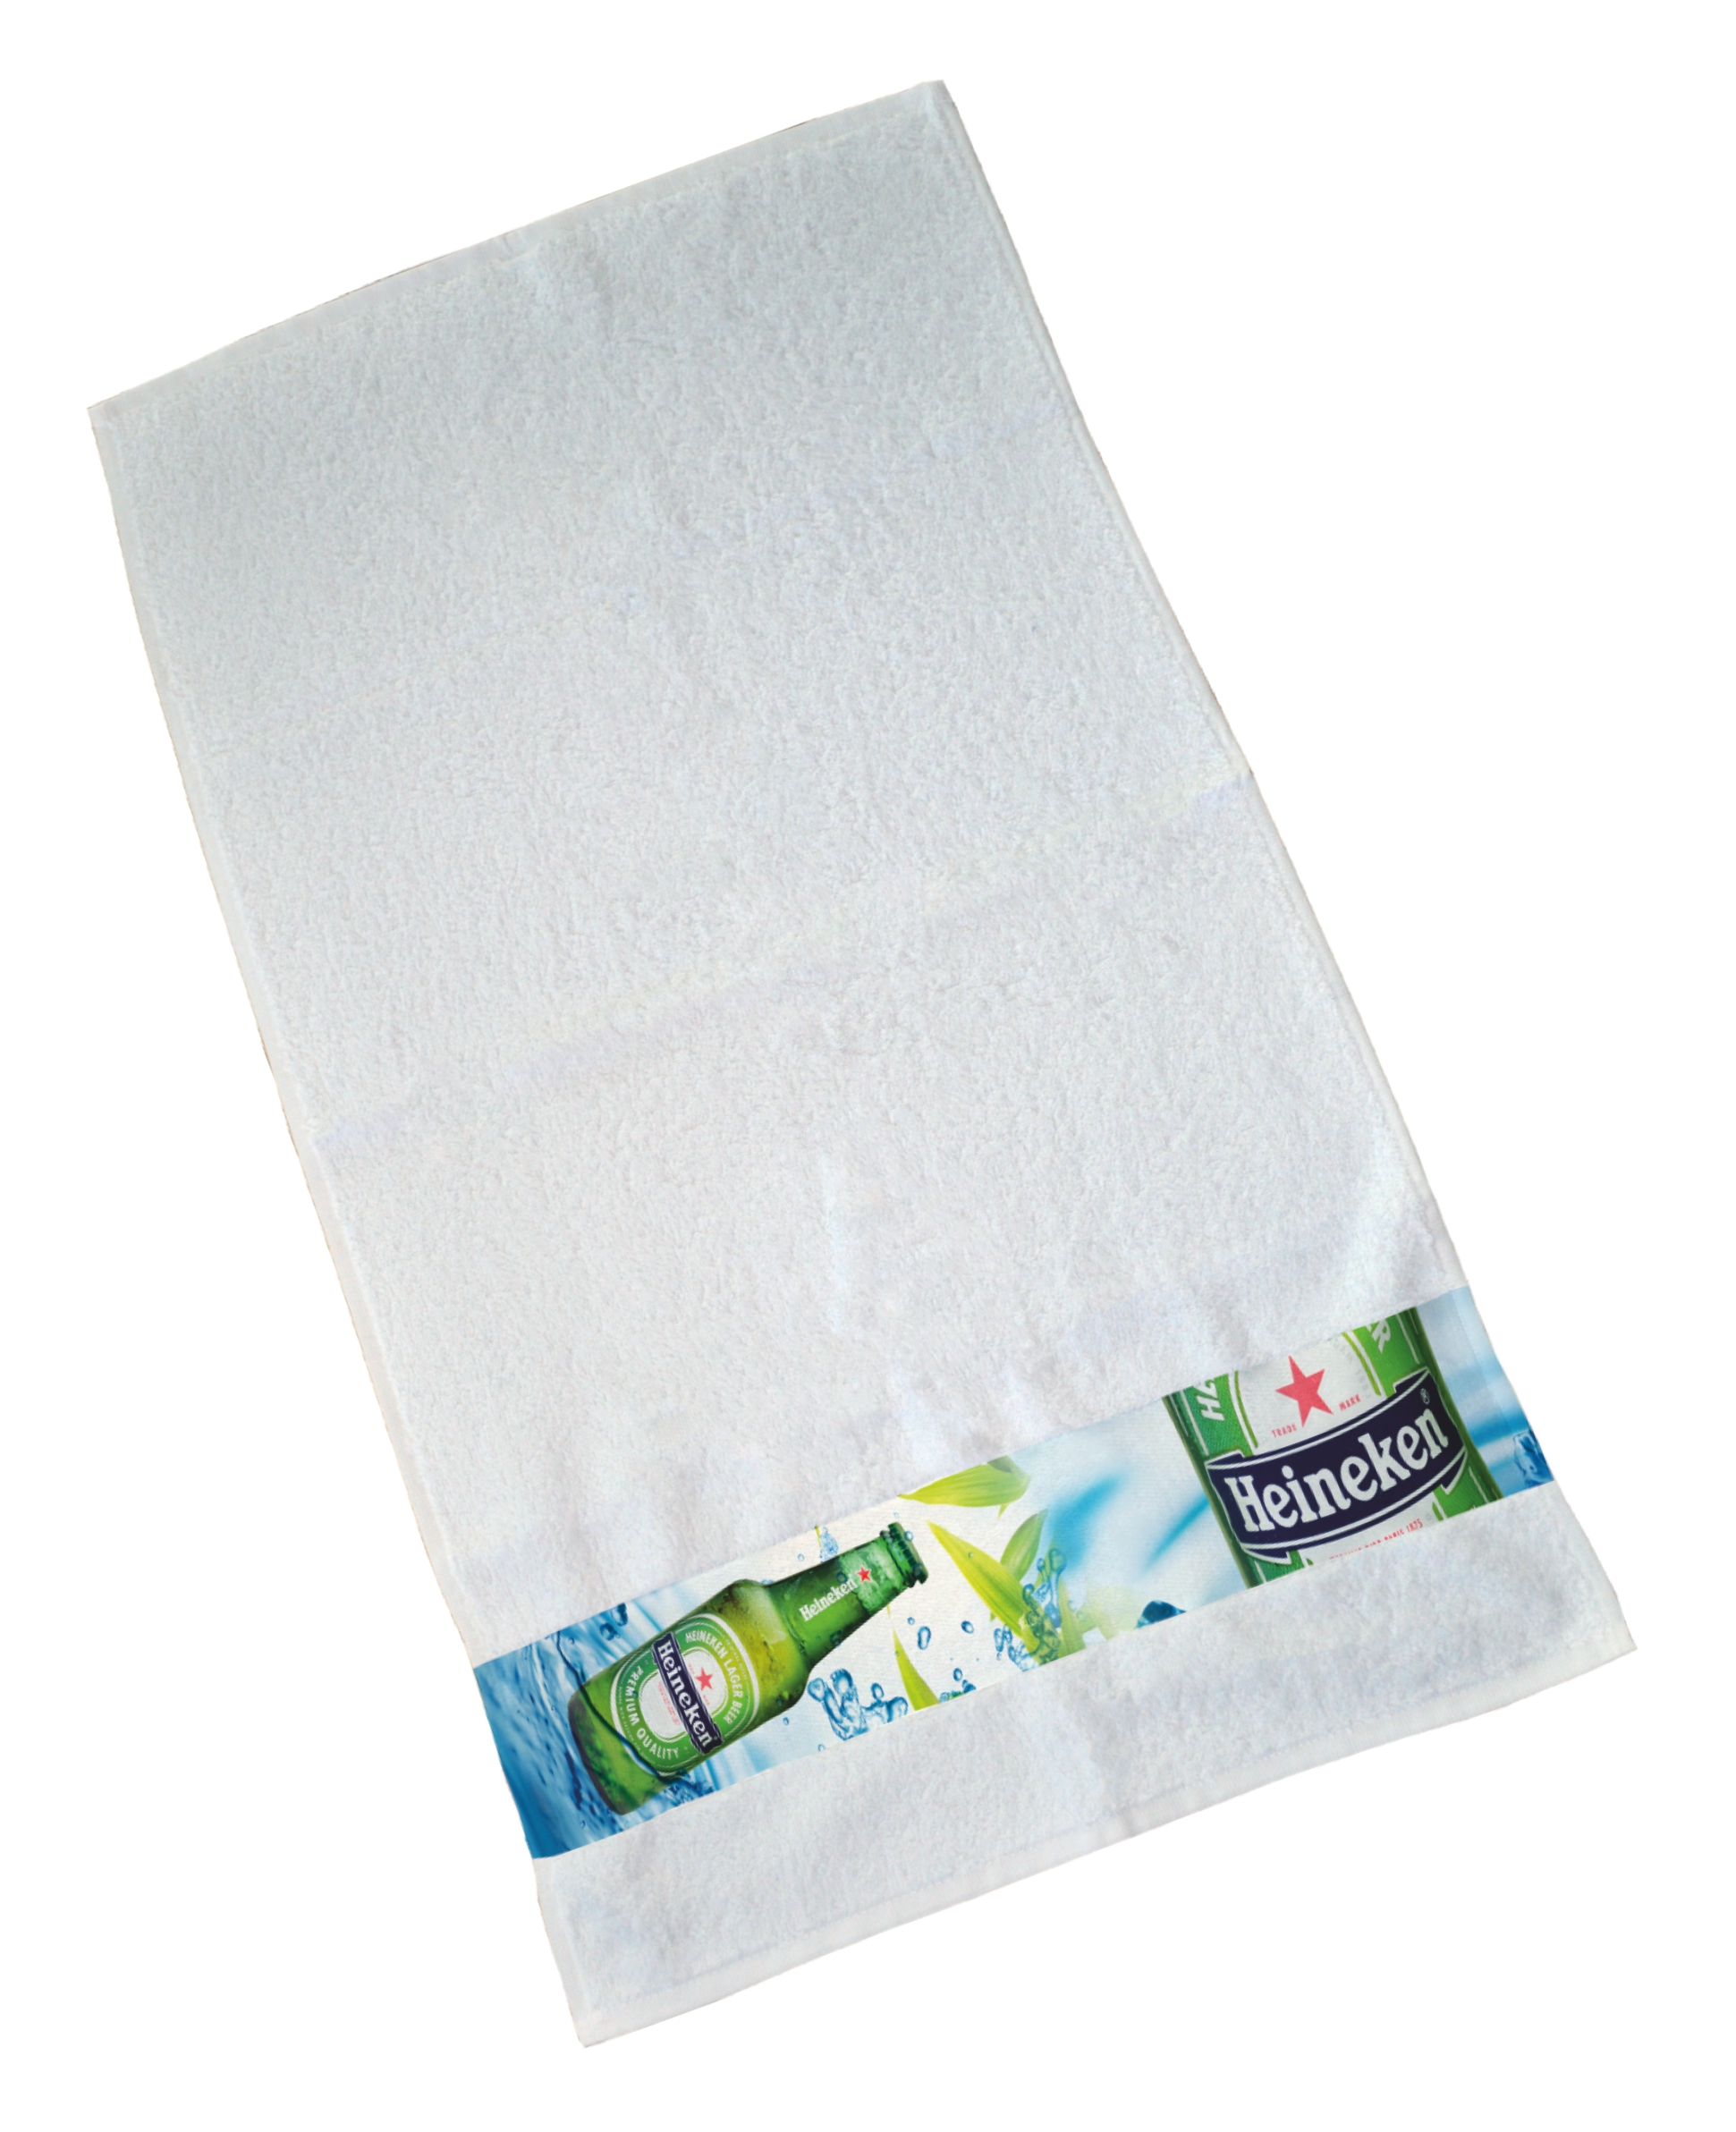 Printed border towel 70 x 140 cm